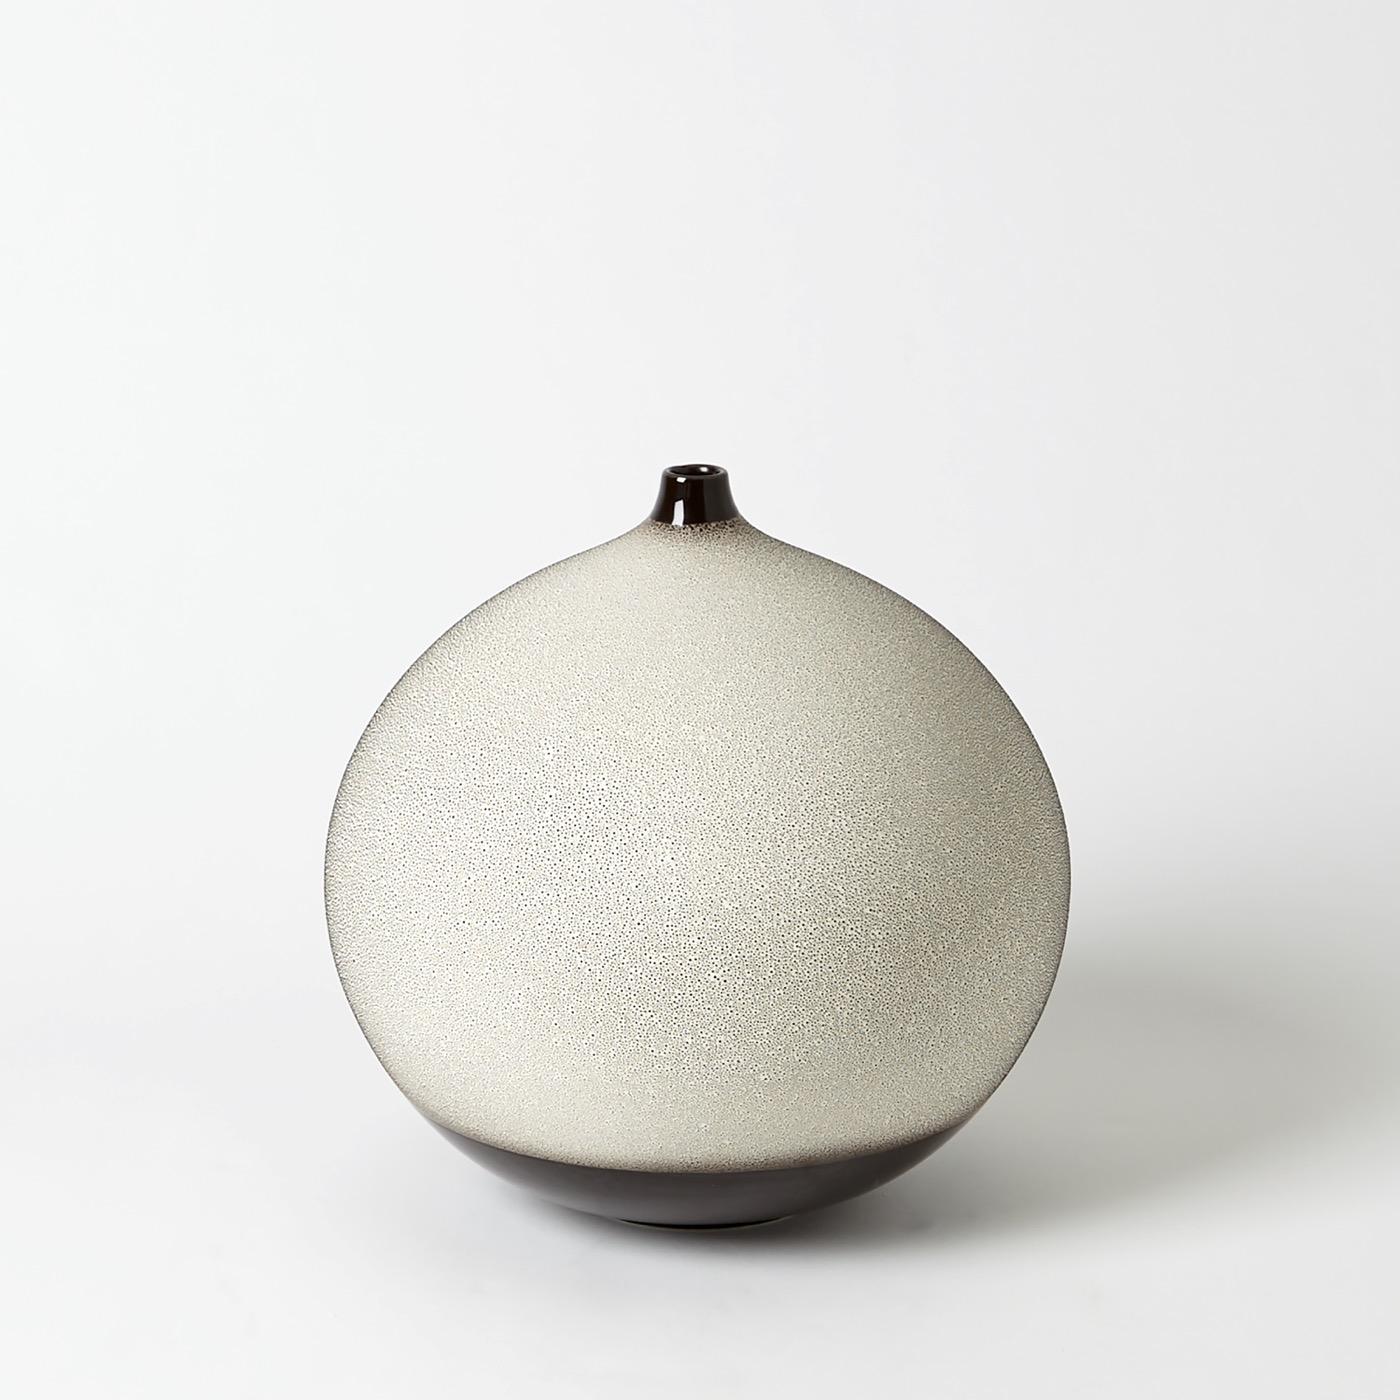 Lombardi Ceramic Vases   Brown